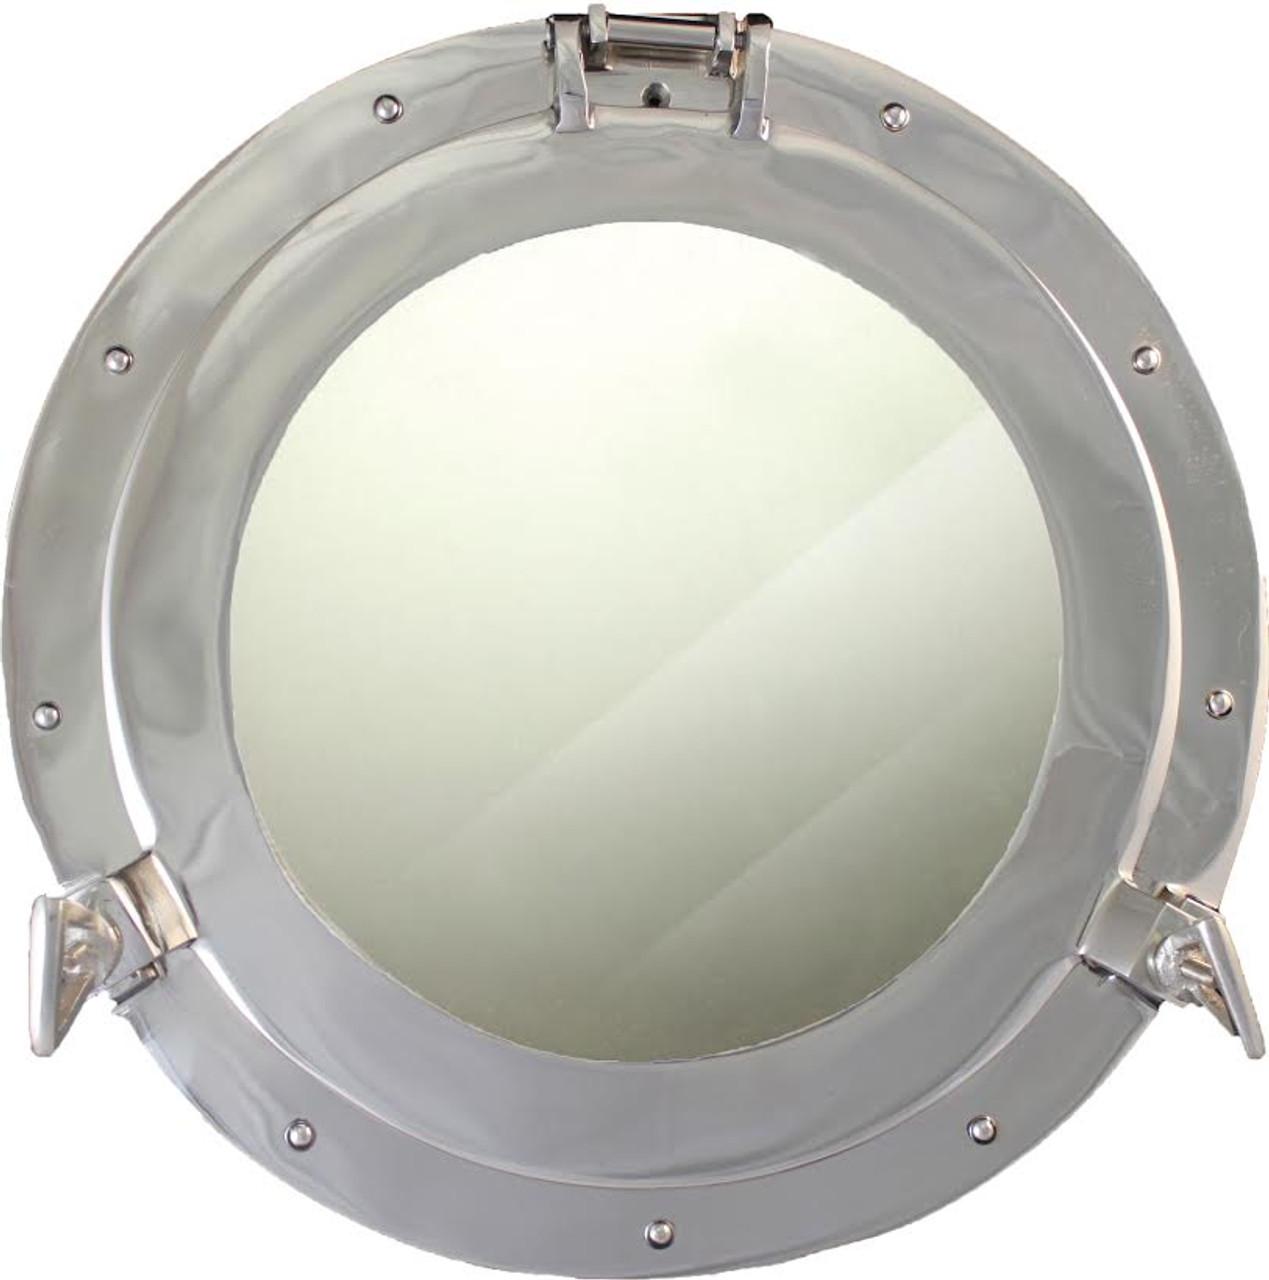 "(BP-701CV 15"") 15"" Aluminum Porthole Mirror with Nickel Finish"